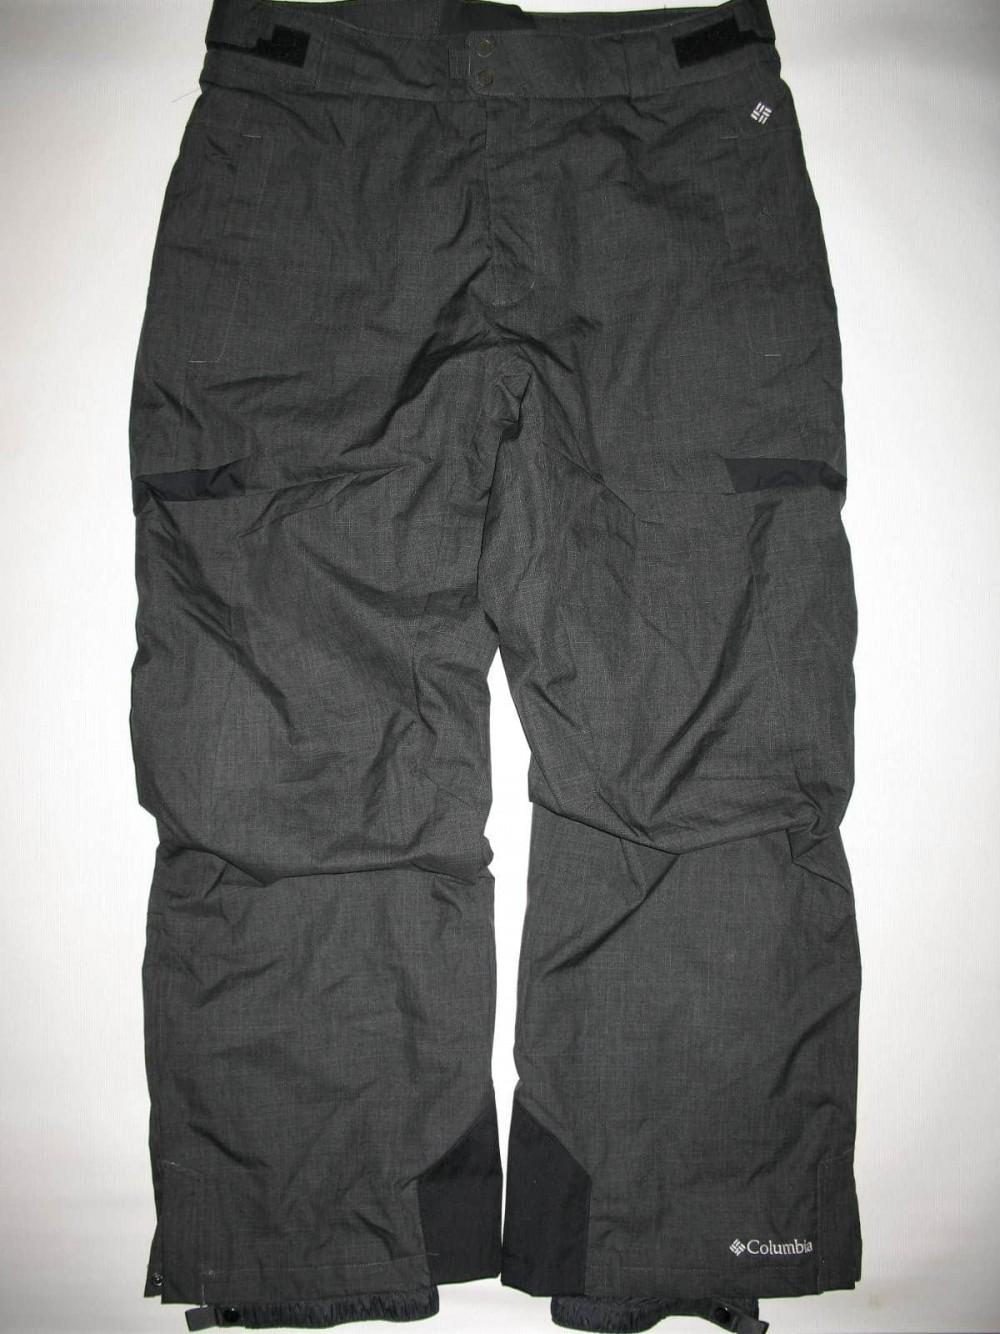 Штаны COLUMBIA echochrome ski pants (размер XL) - 2